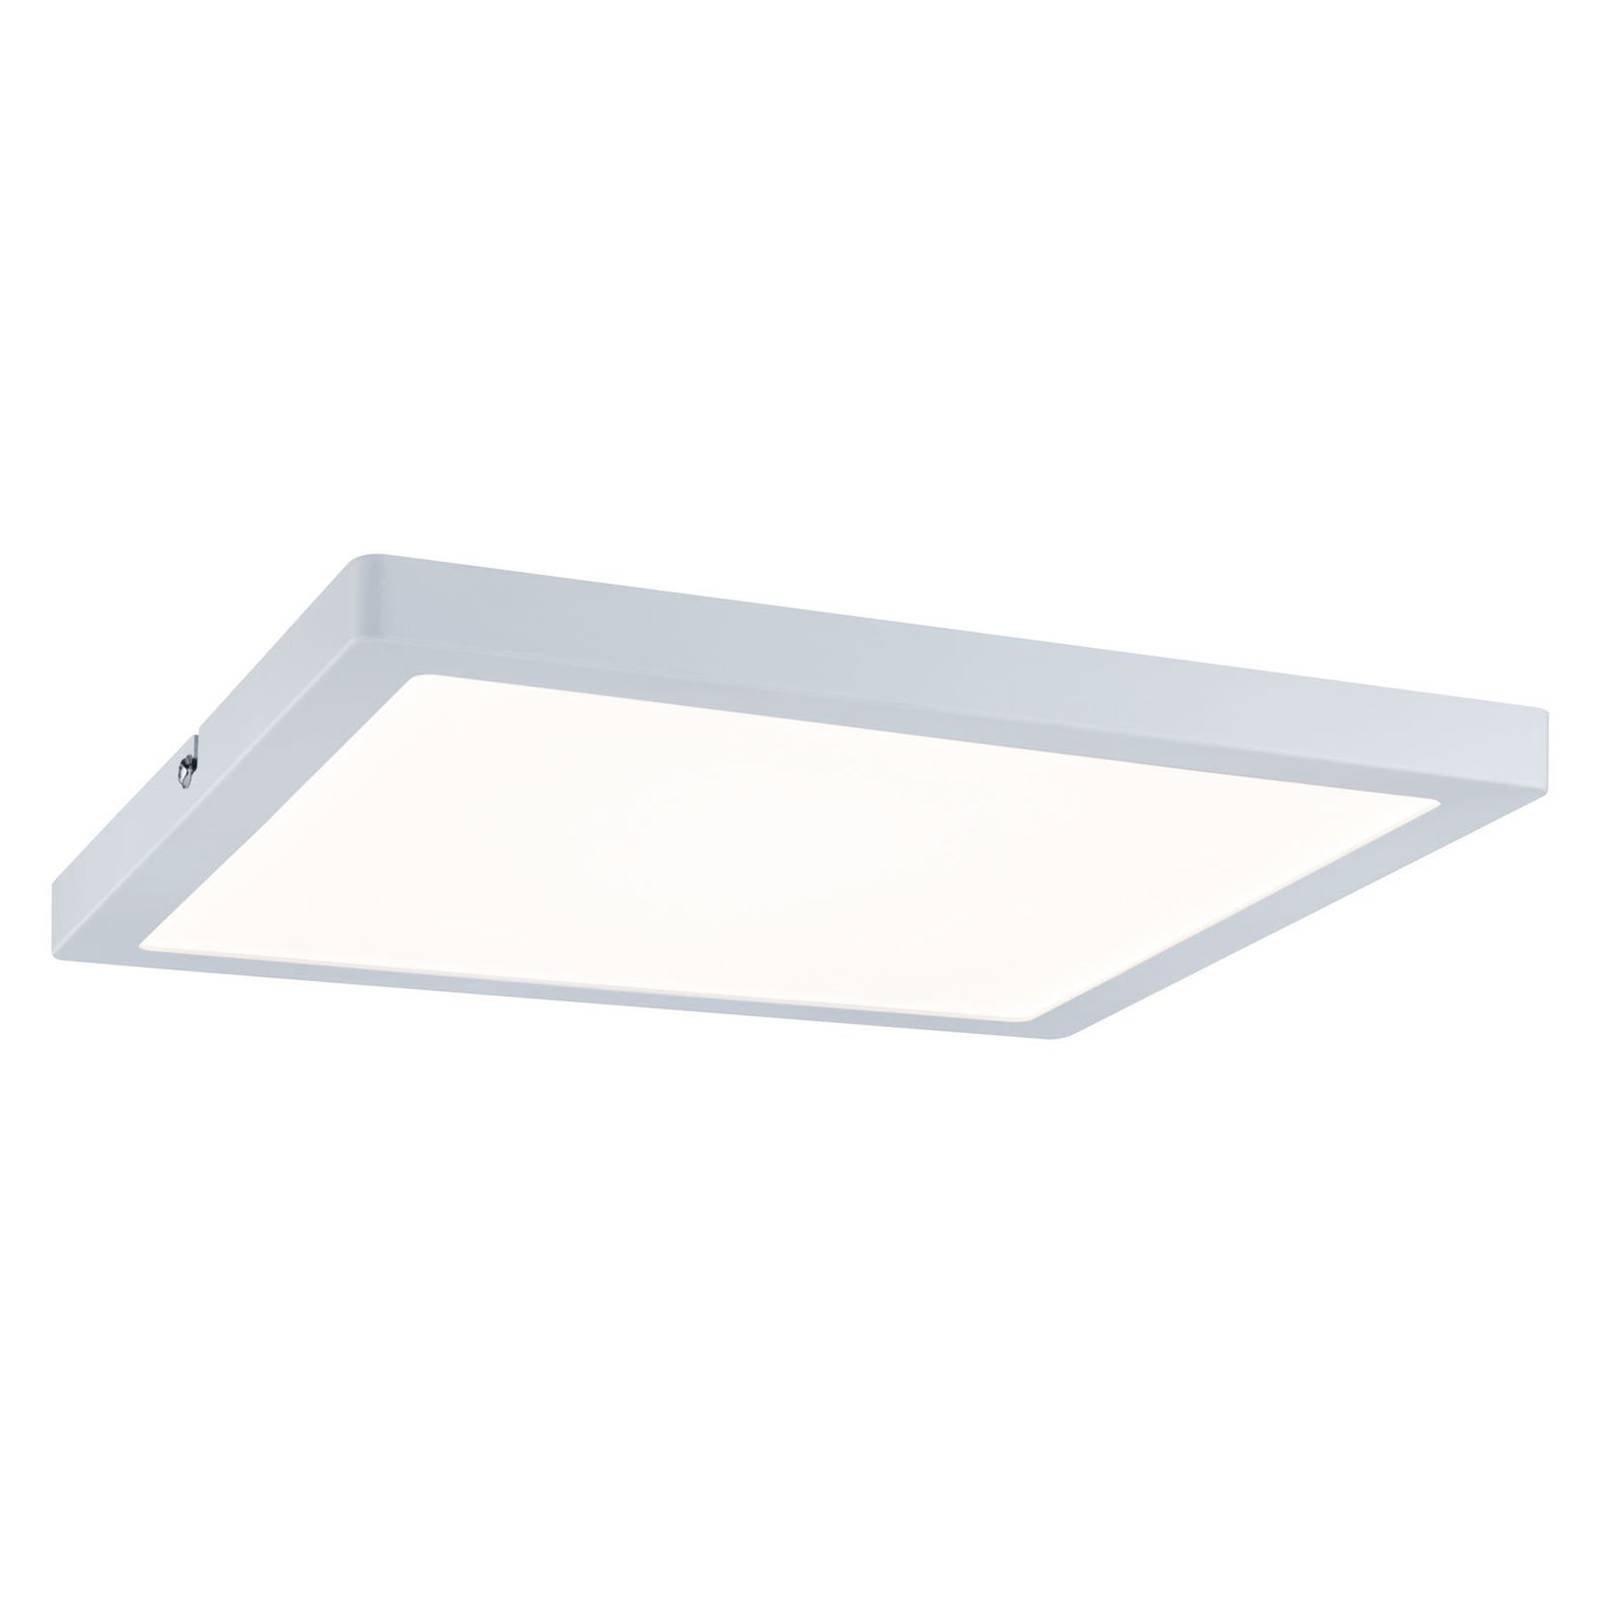 Paulmann Atria LED-taklampe 30 x 30 cm hvit matt